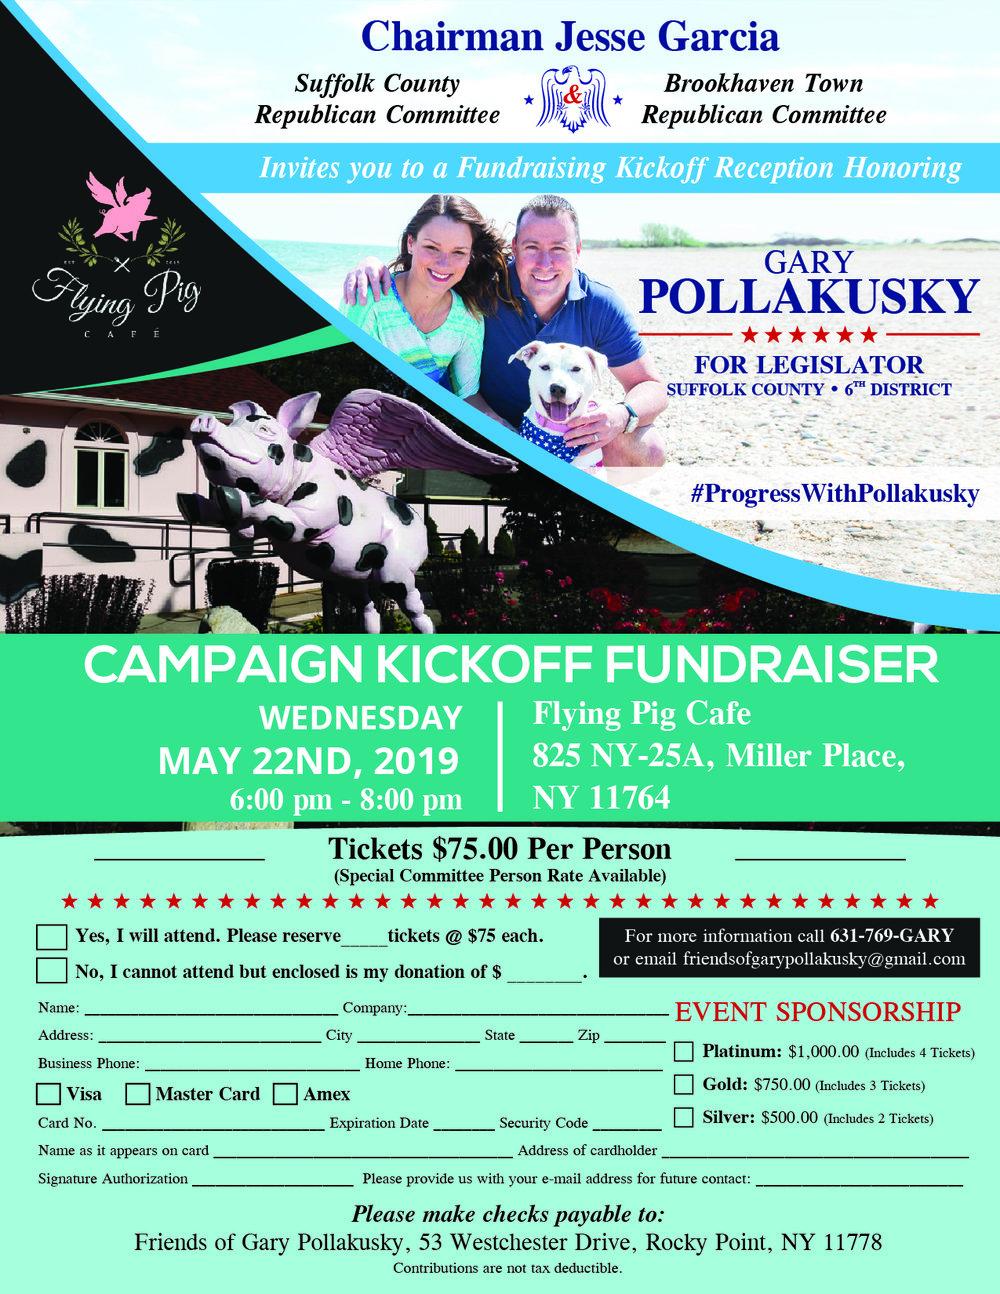 Pollakusky Fundraising Campaign Kickoff Invitation.jpg